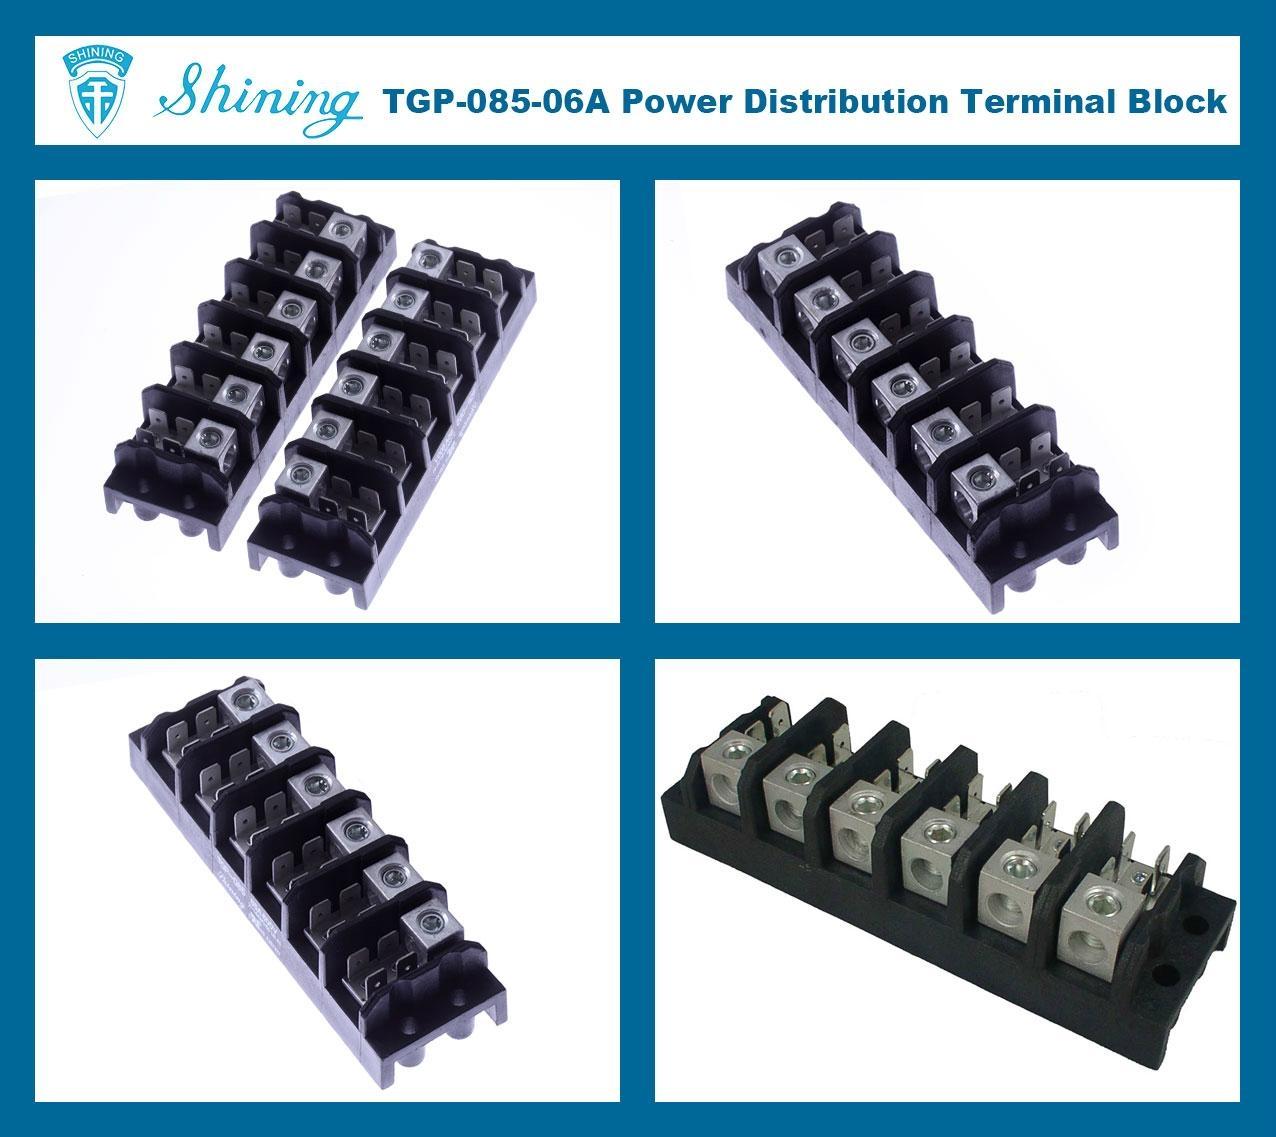 TGP-085-06A 配電端子台 Power Distribution Terminal Block 2